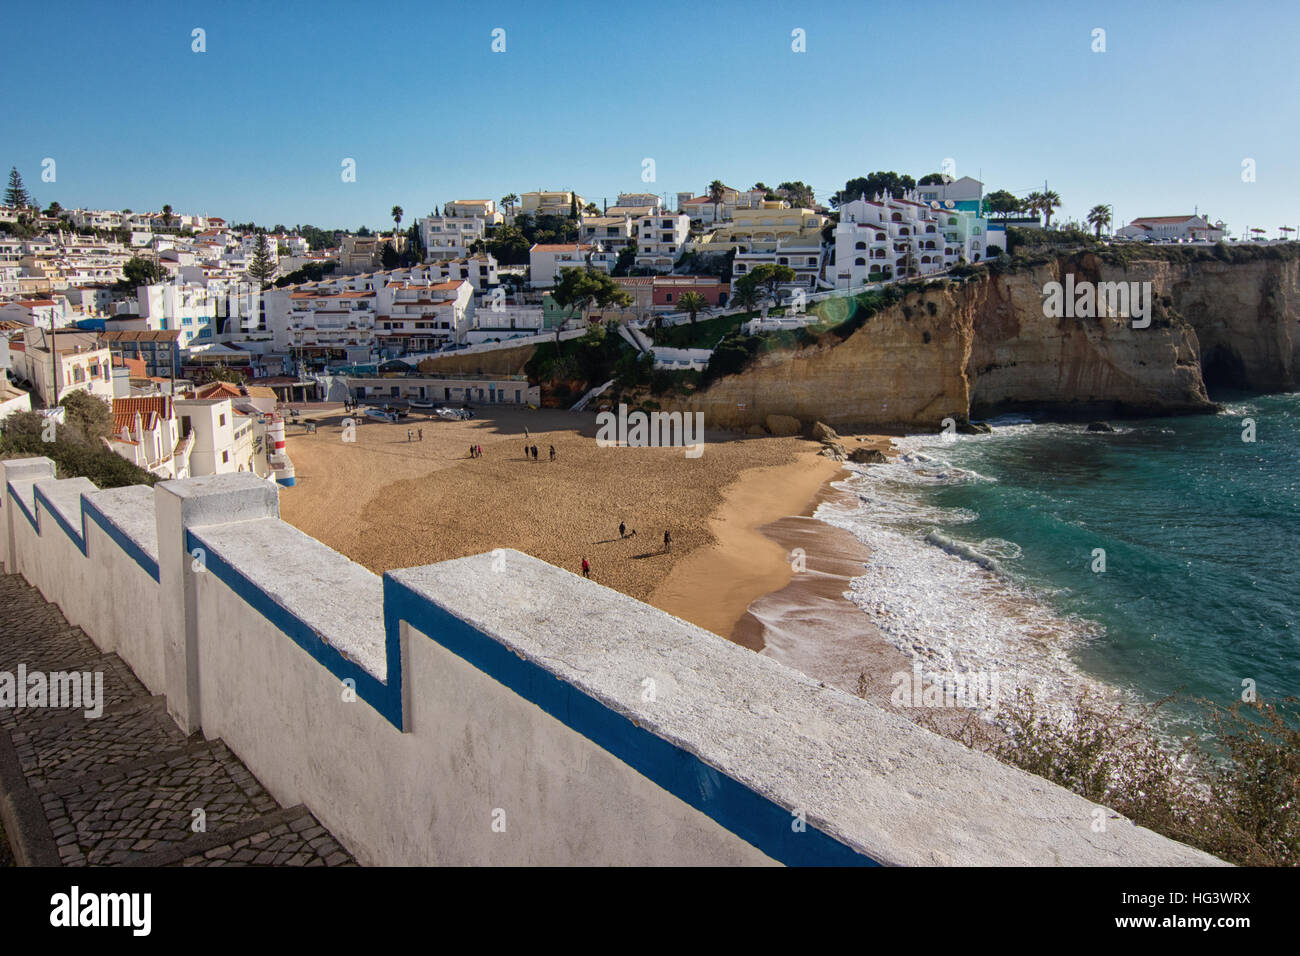 View of Monte Carvoeiro, Lagoa, Algarve Portugal, beach and city Stock Photo